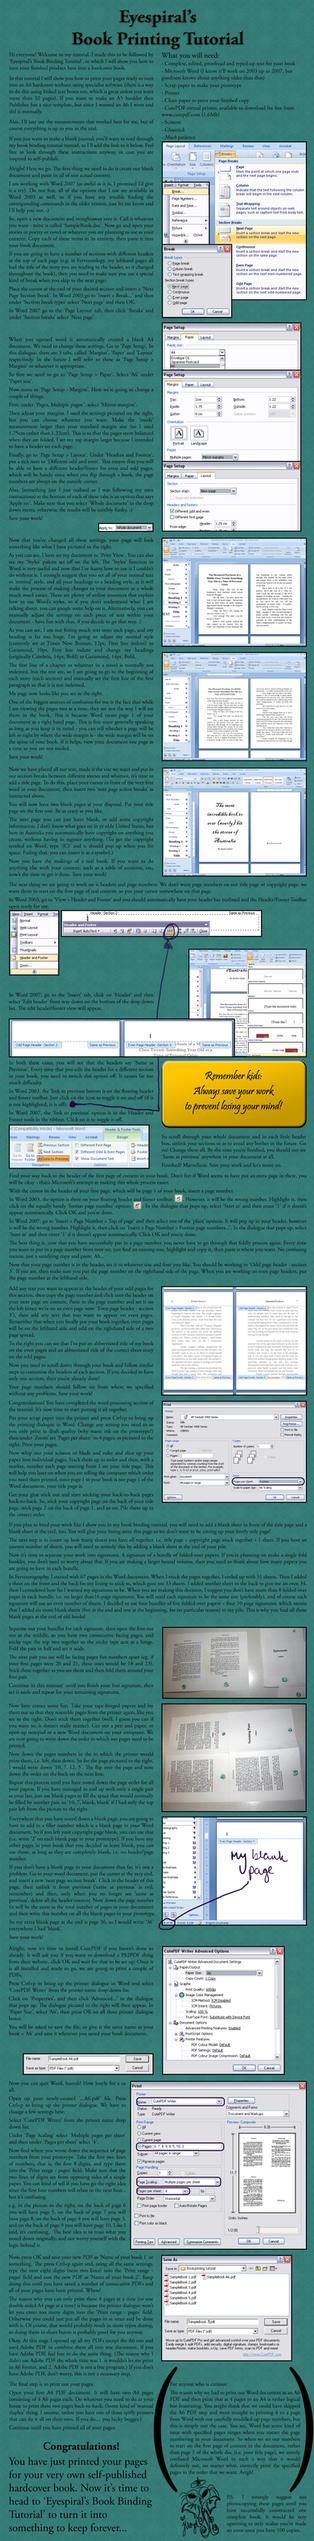 Book Printing Tutorial by Eyespiral-stock